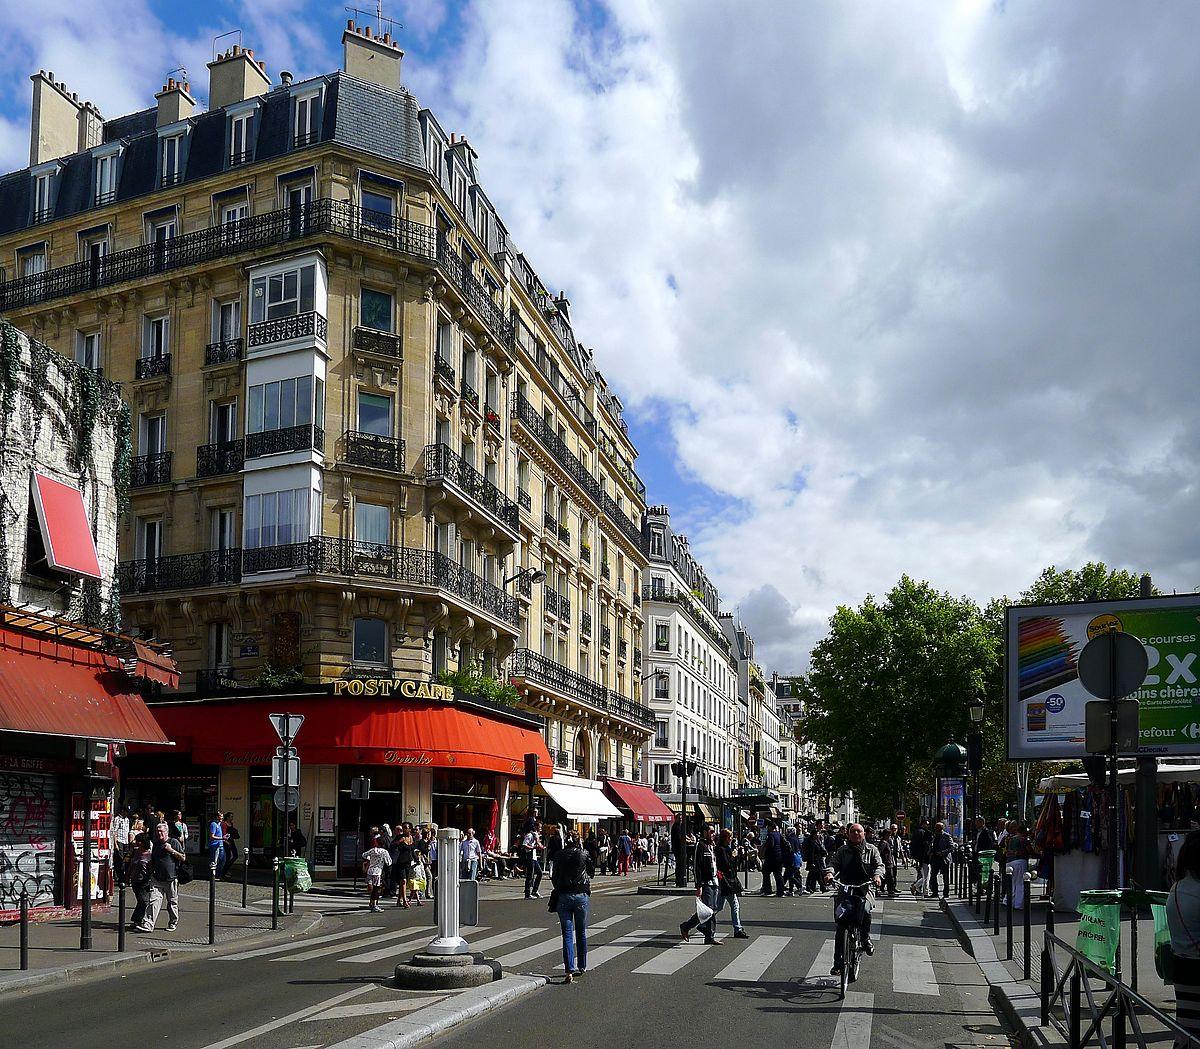 Boulevard de rochechouart wikip dia - 30 avenue de la porte de clignancourt ...